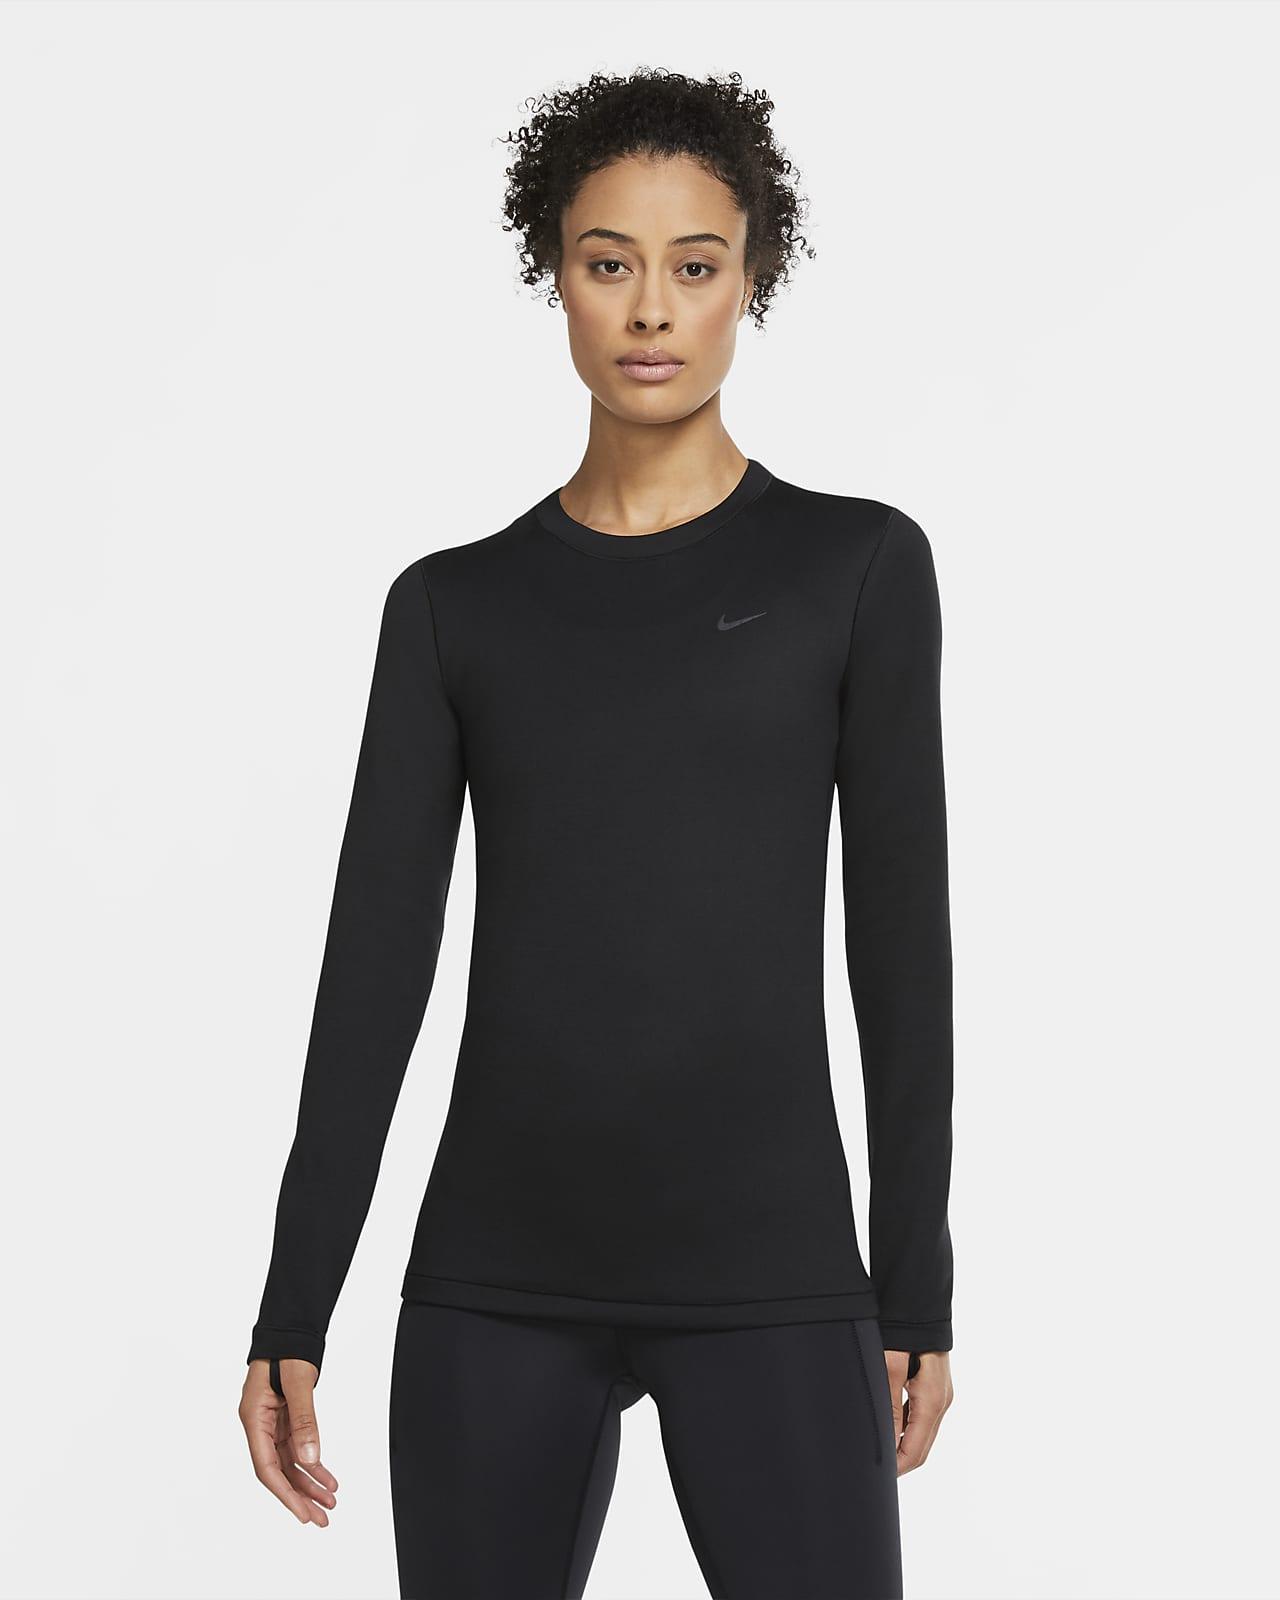 Haut Nike Pro Therma pour Femme